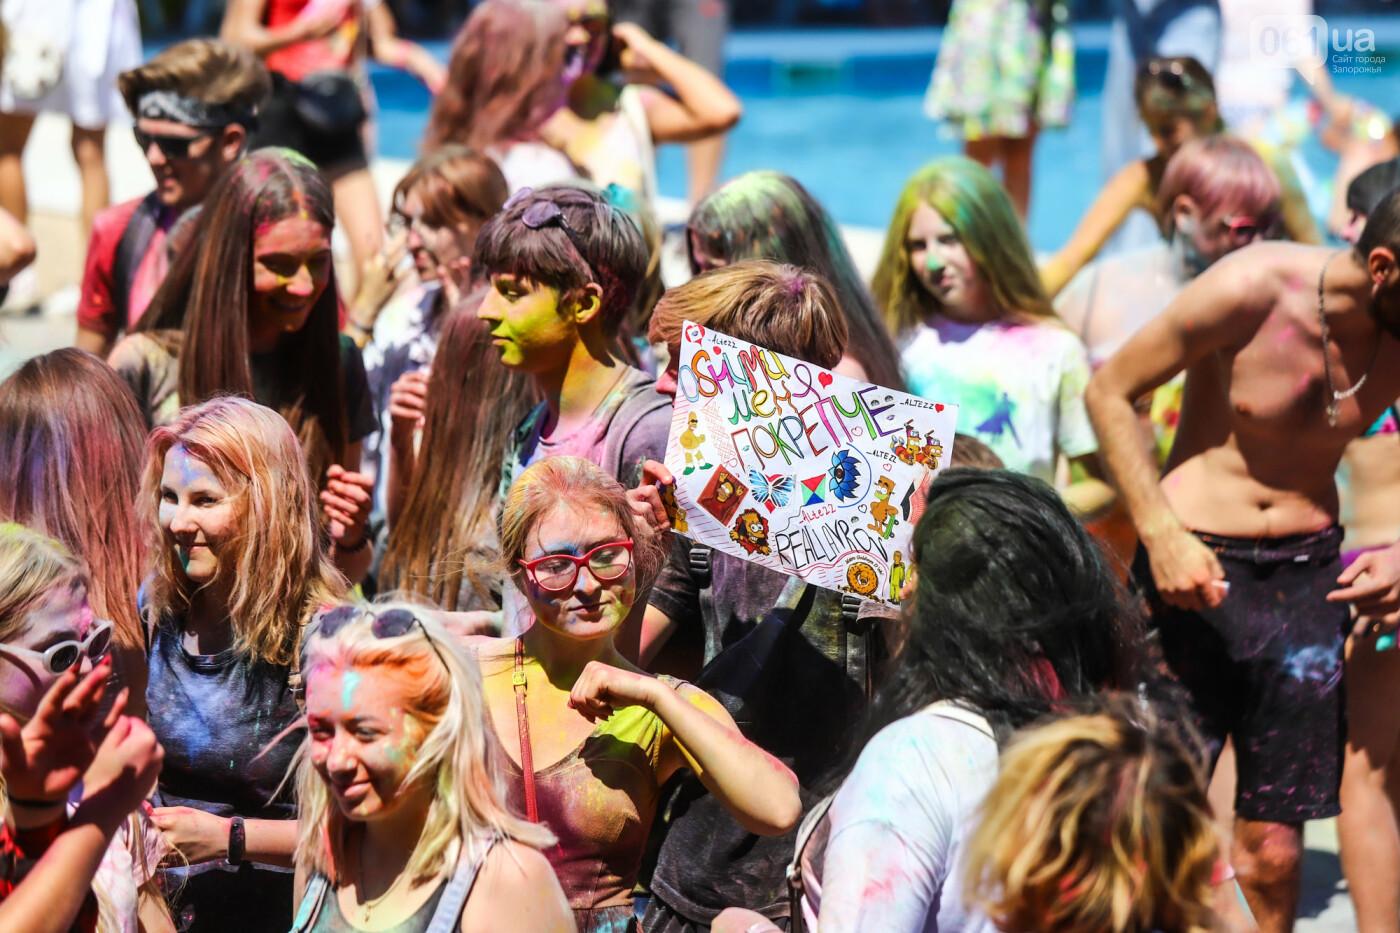 Сотни запорожцев приняли участие в фестивале красок Холи, - ФОТОРЕПОРТАЖ, фото-20